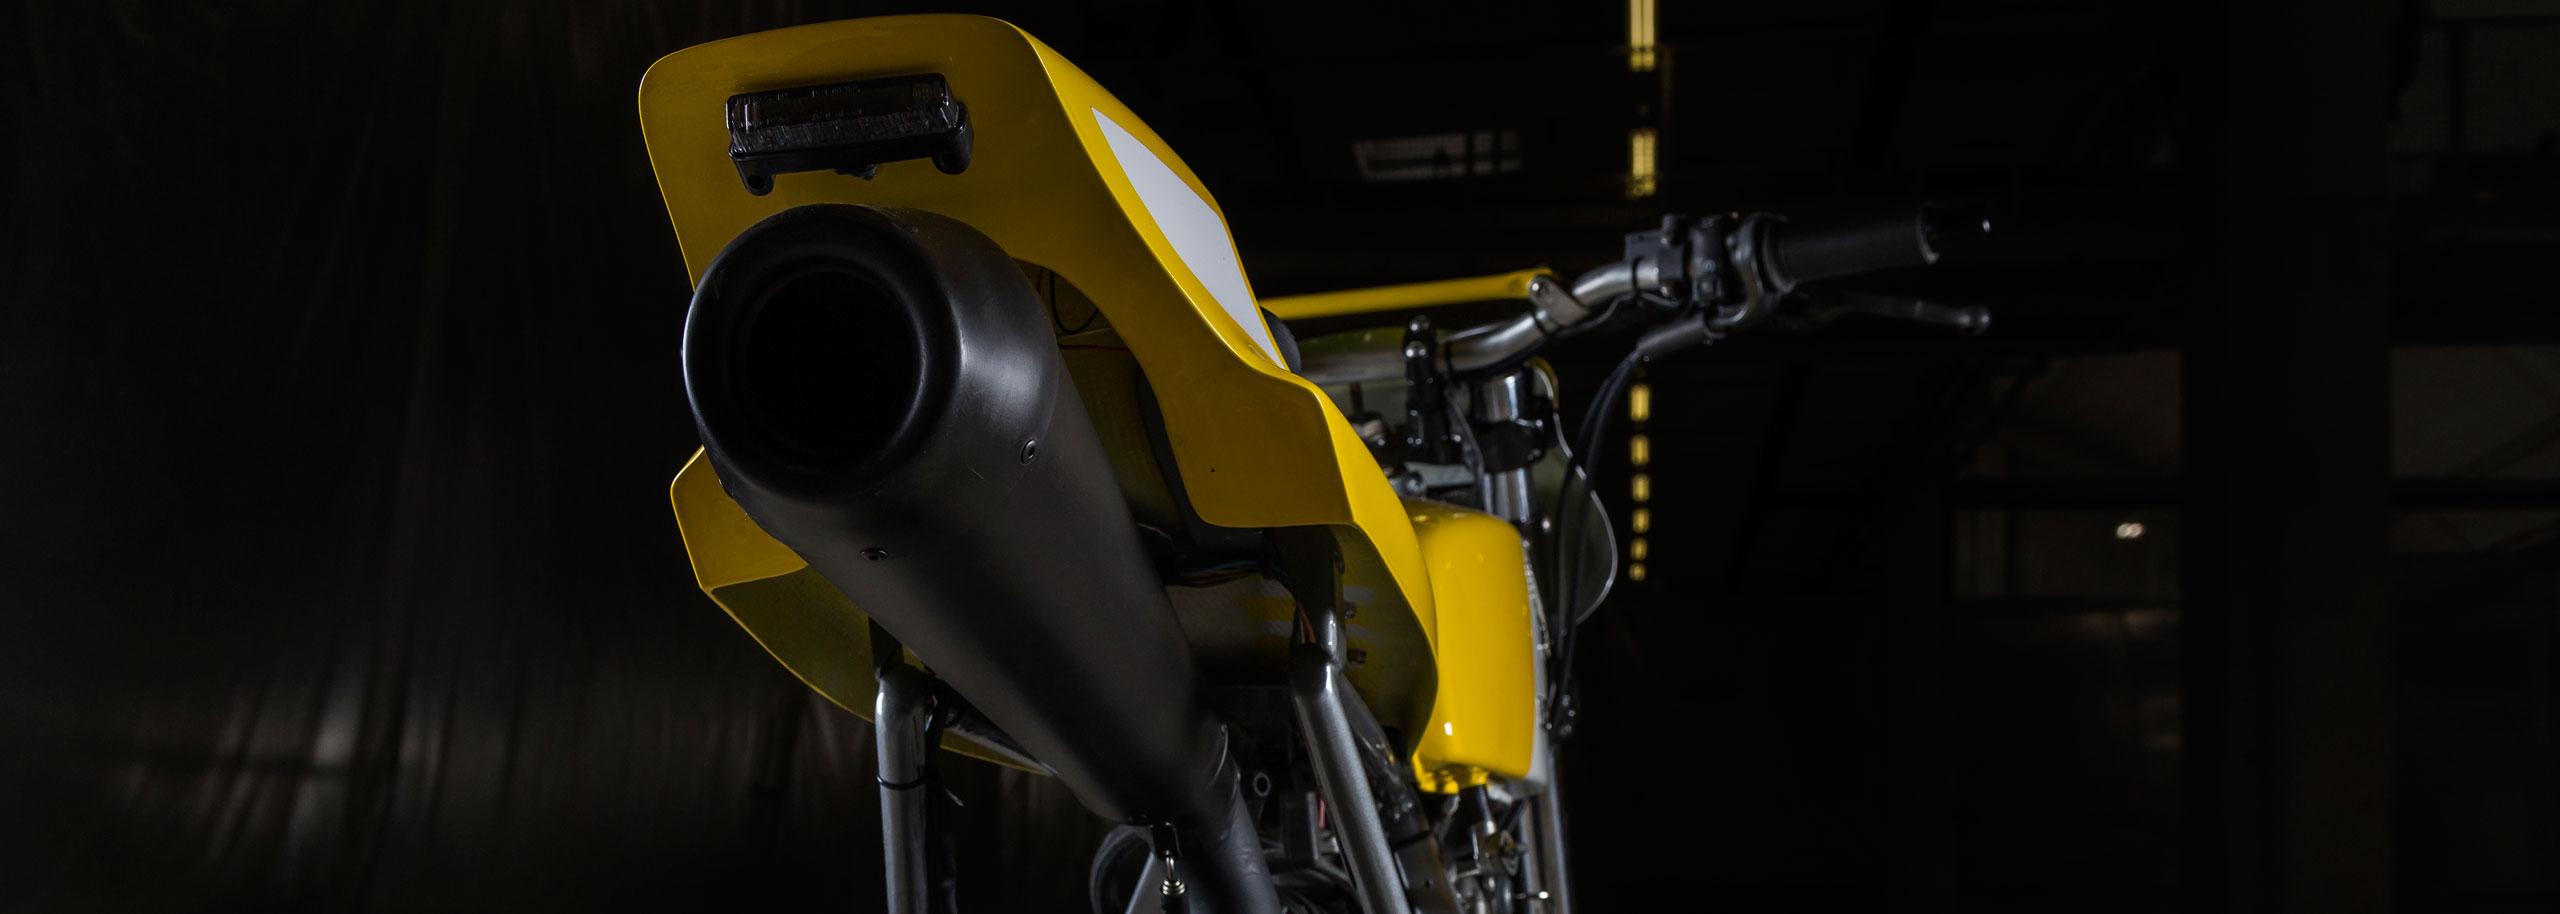 02_TITAN-Domina-Honda-Dominator-Umbau-Cafe-Racer-Graz-Motorrad-Umbau-Austria-Vintage_Custom-Bikes_Motorrad-Umbauten_Styrian-Design